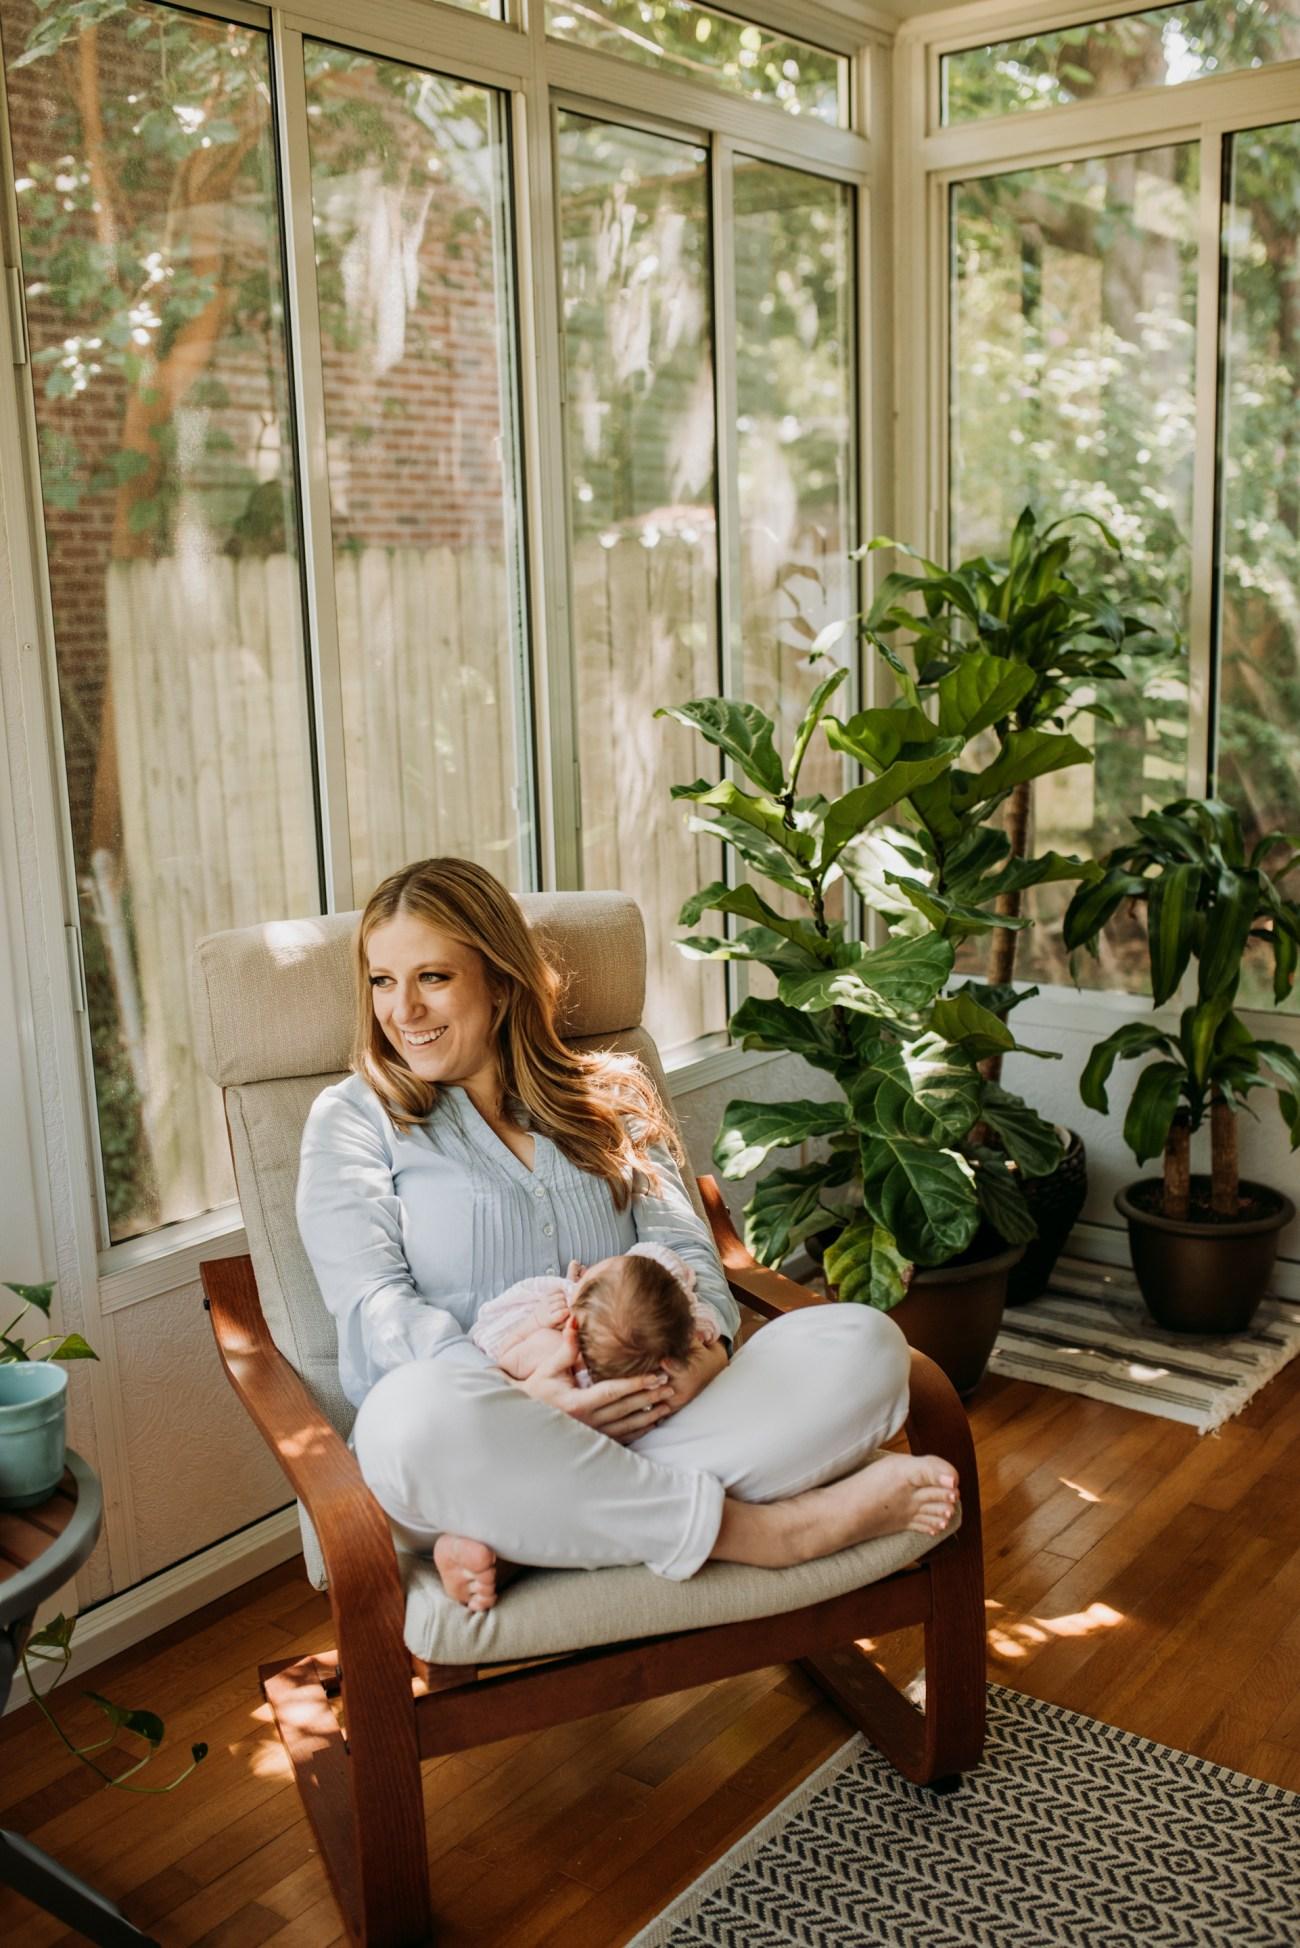 CamilleCamachoPhotography_Virginia_Lifestyle_Newborn-33